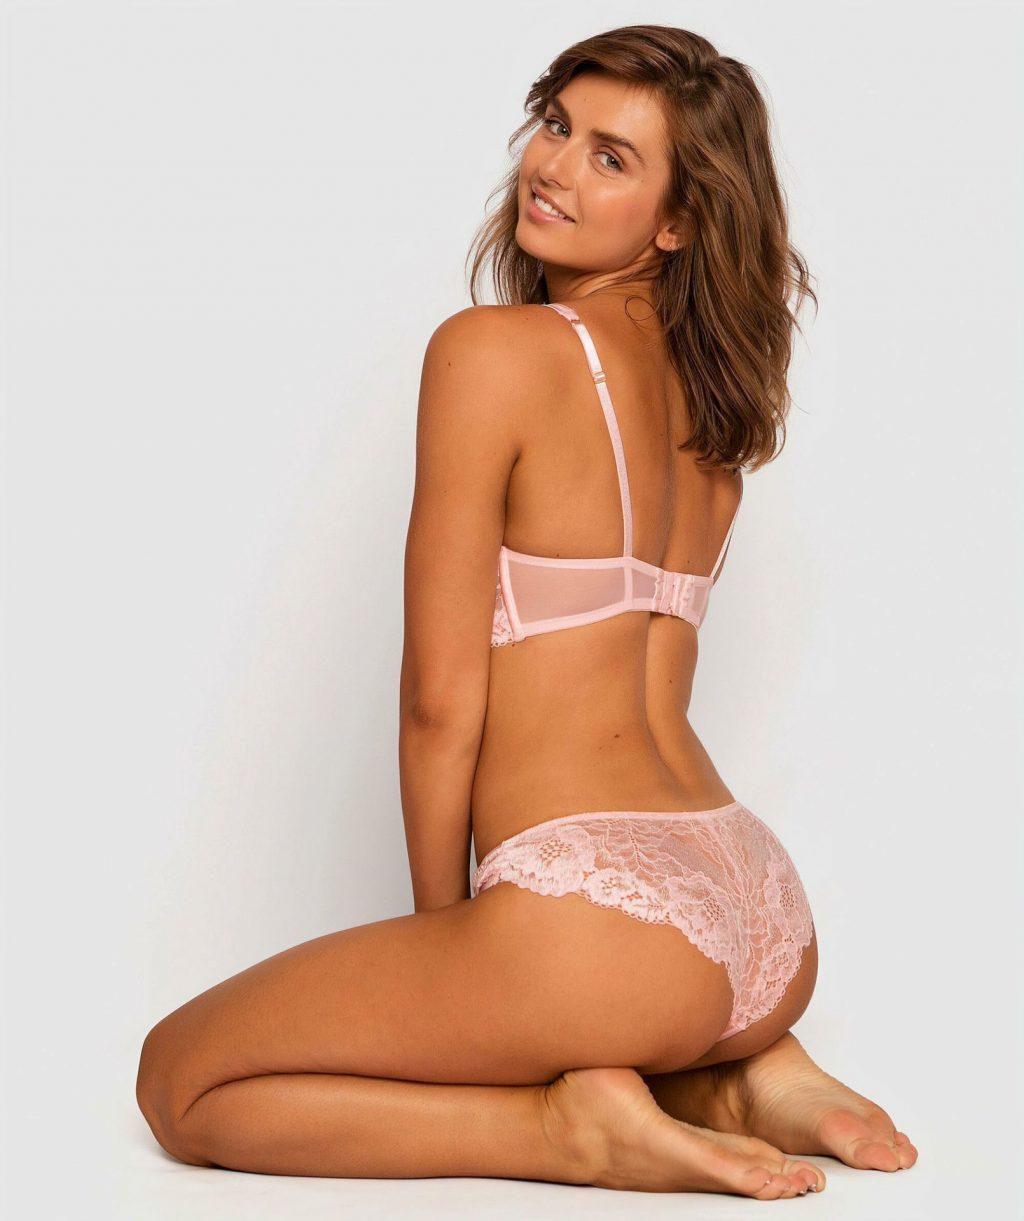 Anastasiya Jepsen Sexy (29 Photos)